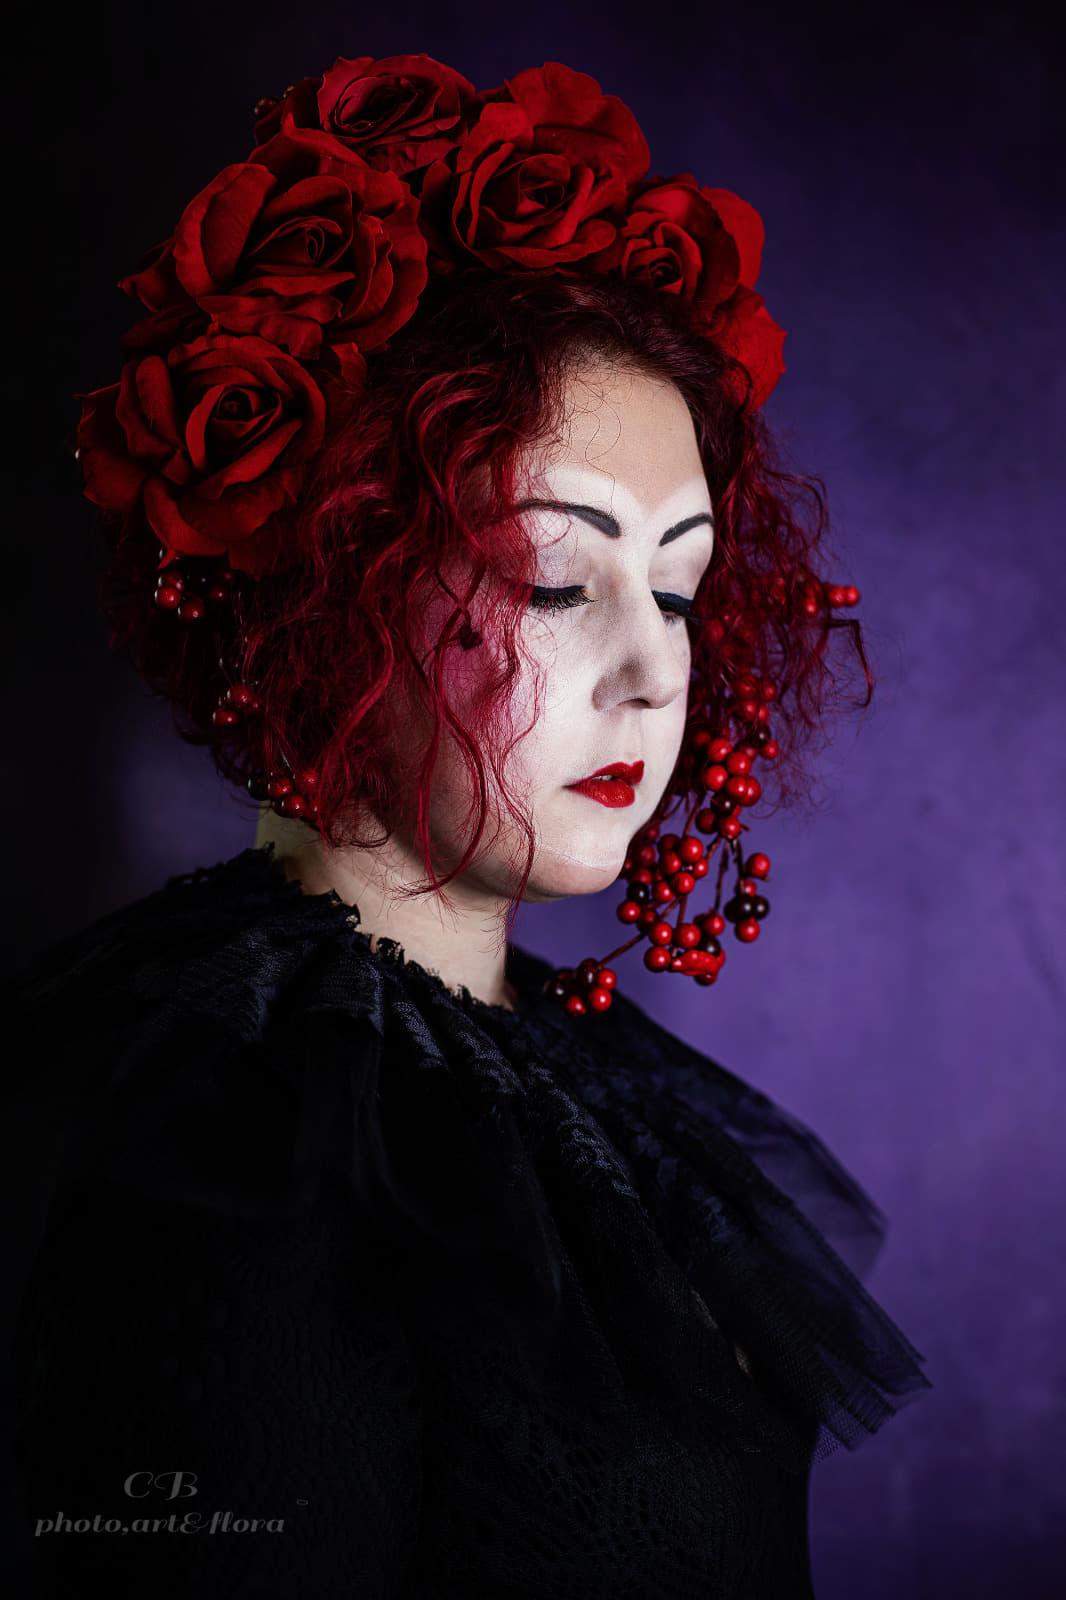 Fotoprojekt Claudia Bellinghausen